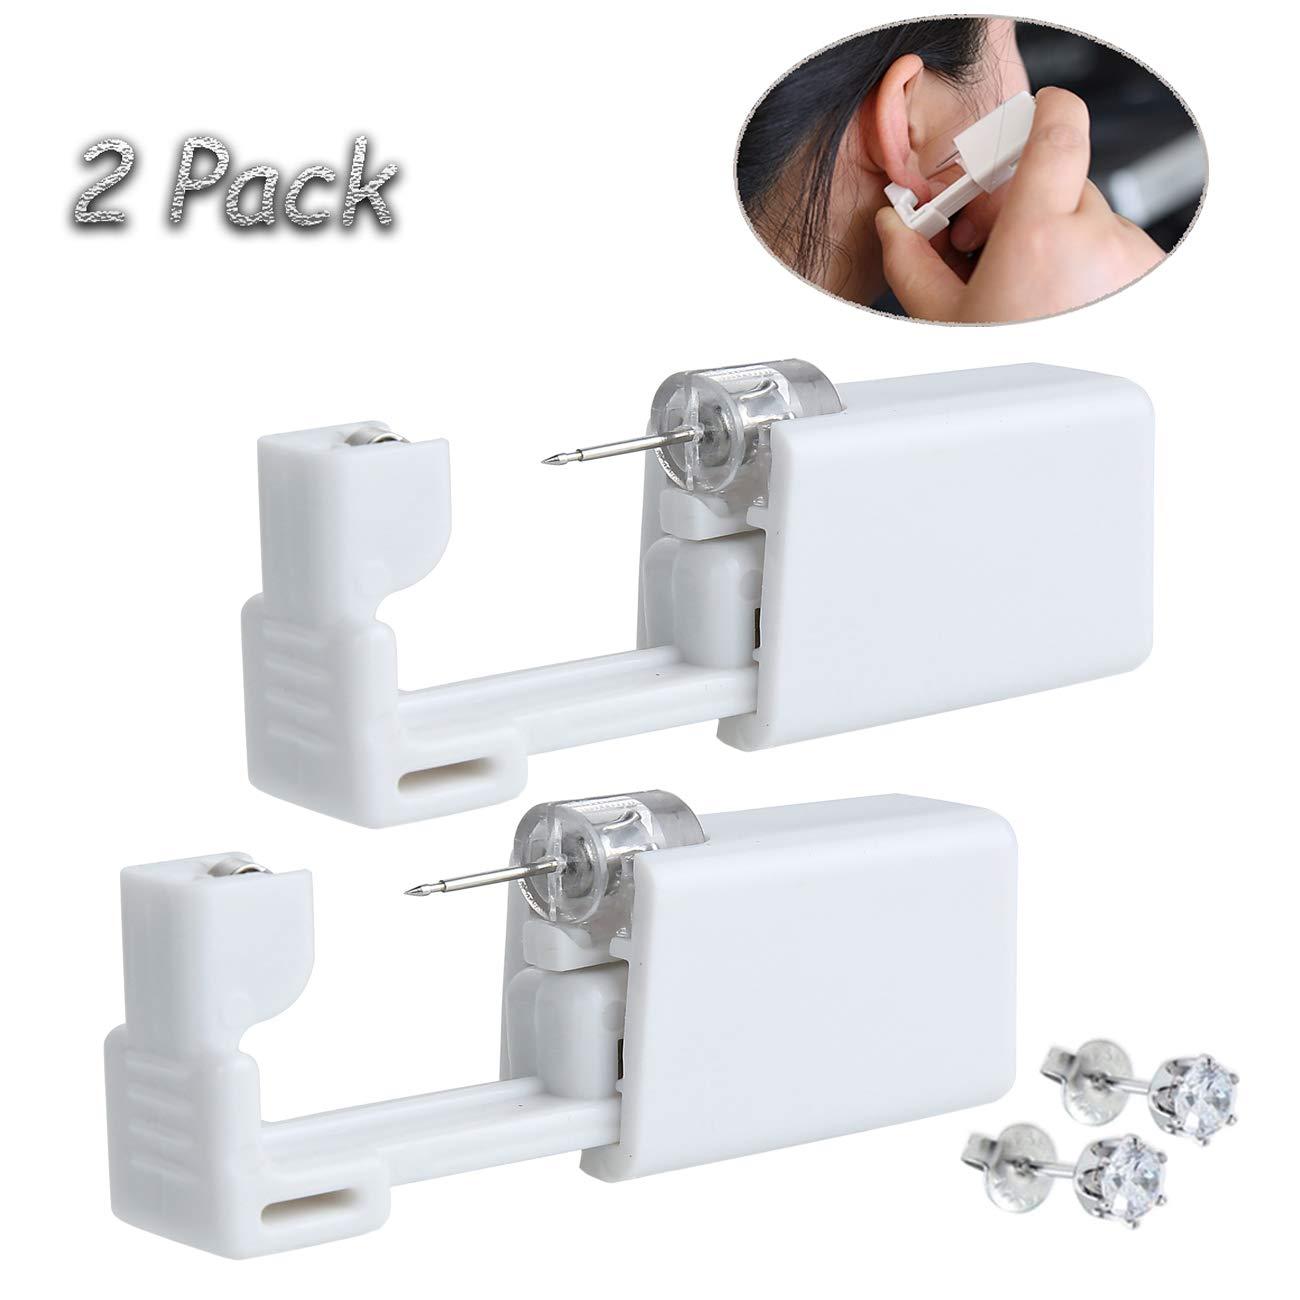 2 Pack Self Ear Piercing Gun Disposable Self Ear Piercing Gun Kit Safety Ear Piercing Gun Kit Tool - 5mm Crystal